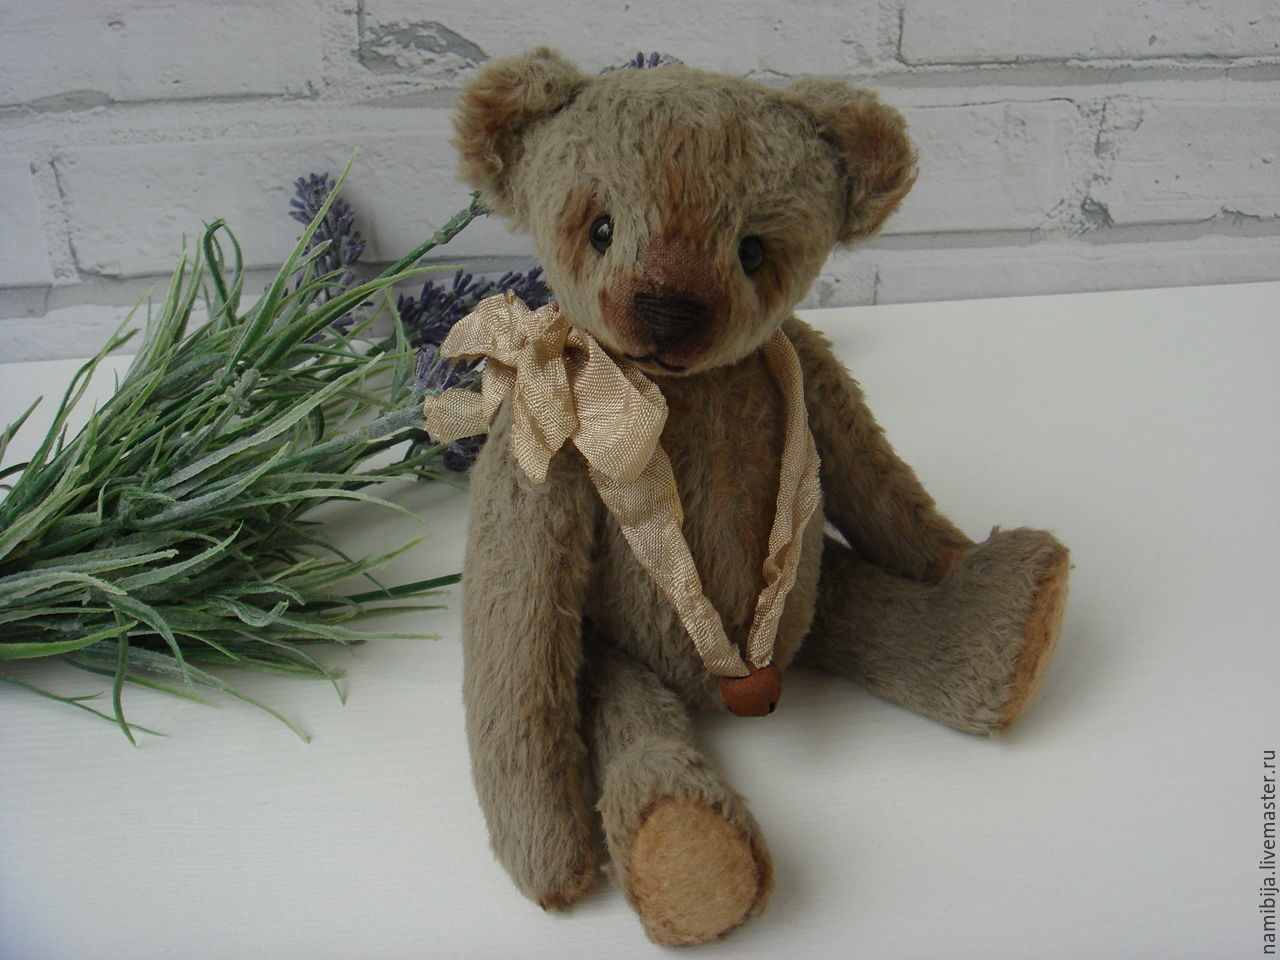 Мишка Потапчик, Мягкие игрушки, Санкт-Петербург,  Фото №1